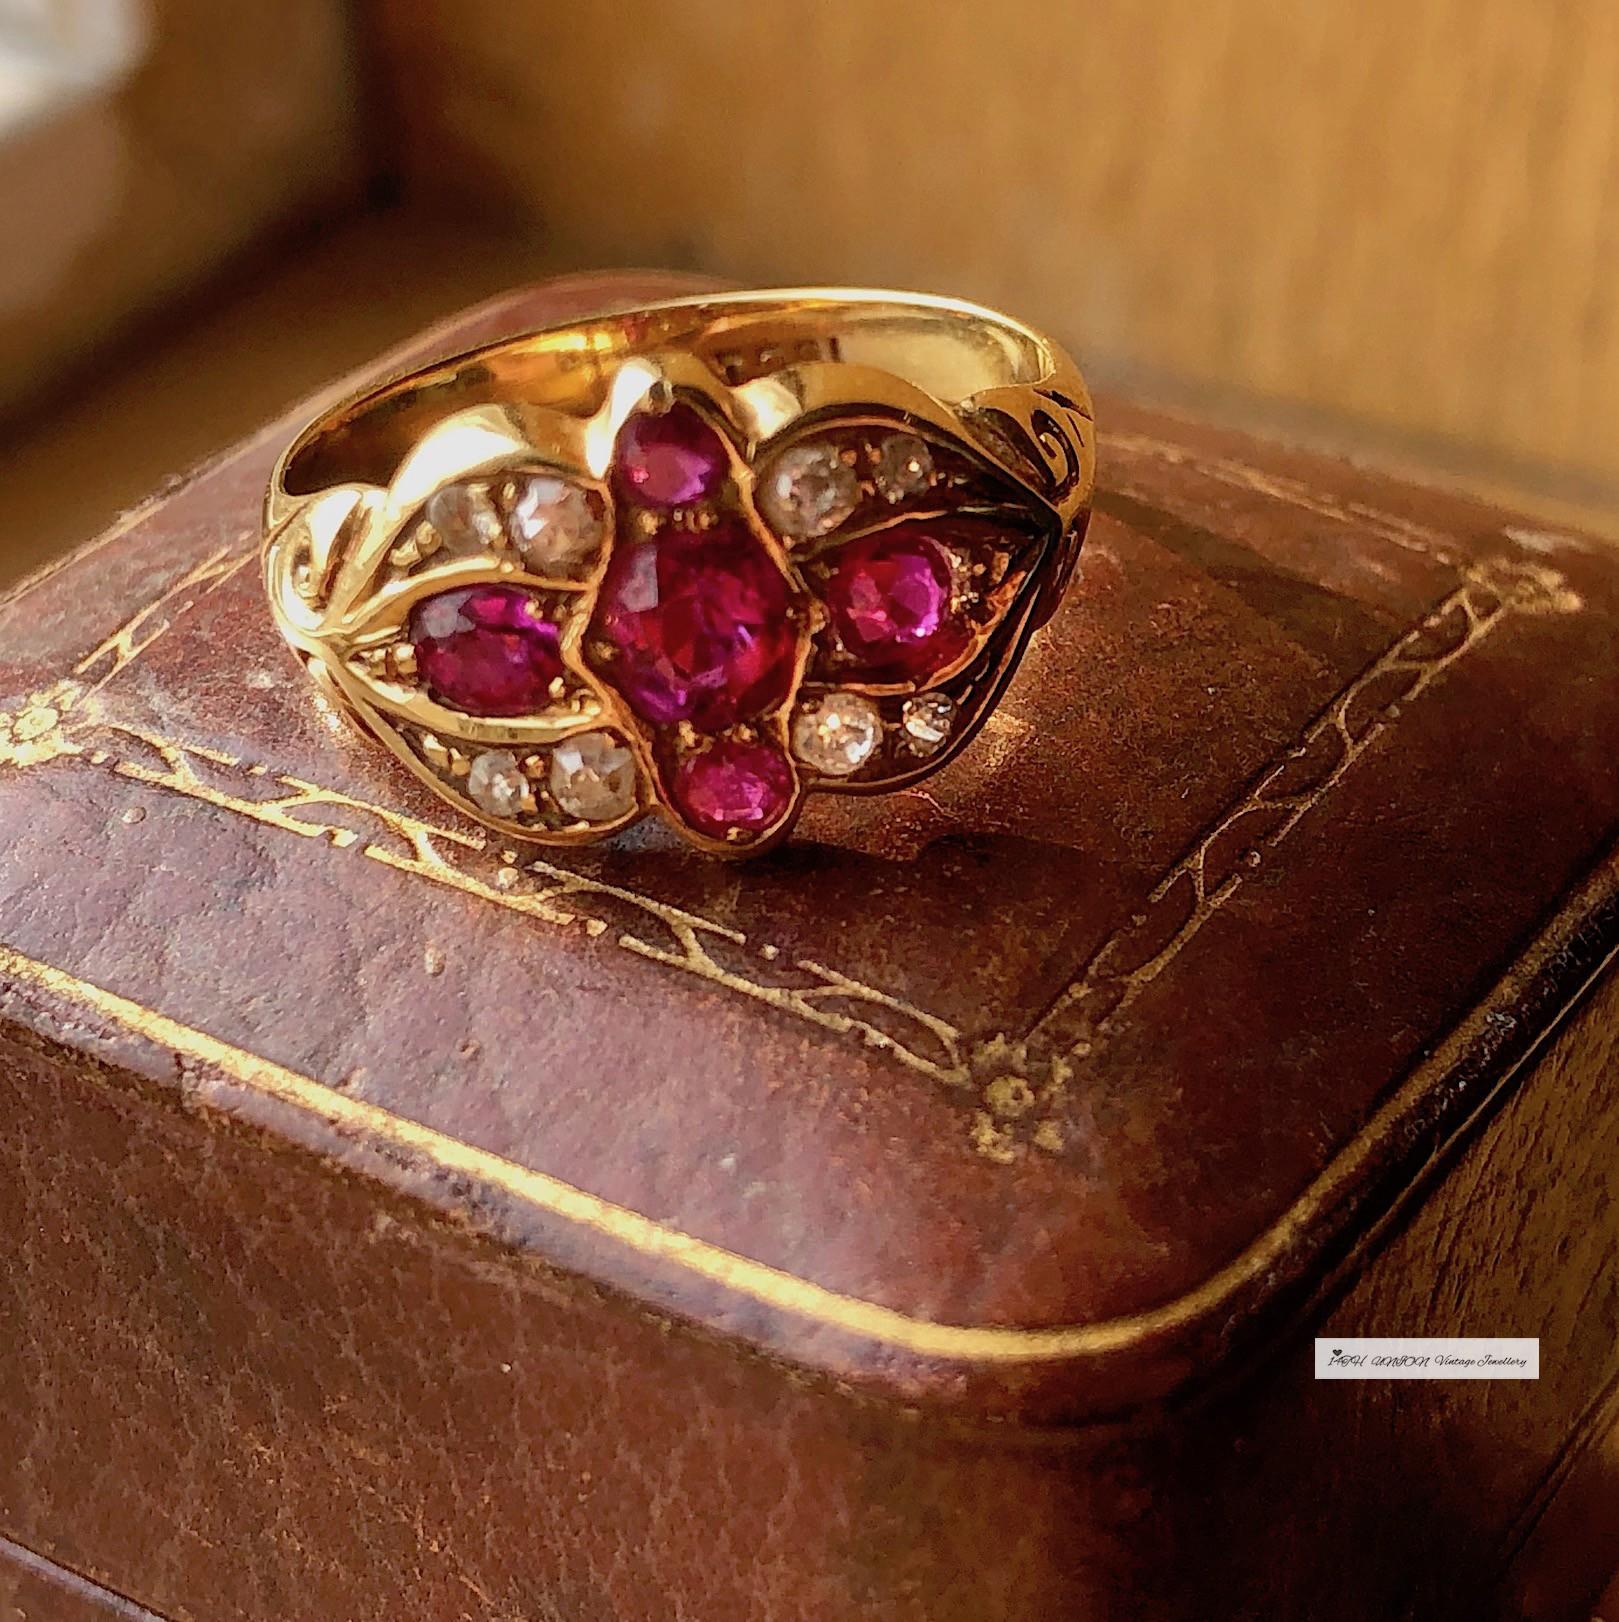 14THUNION 英国古董天然缅甸老矿红宝石娇艳深桃红色黄金钻石戒指